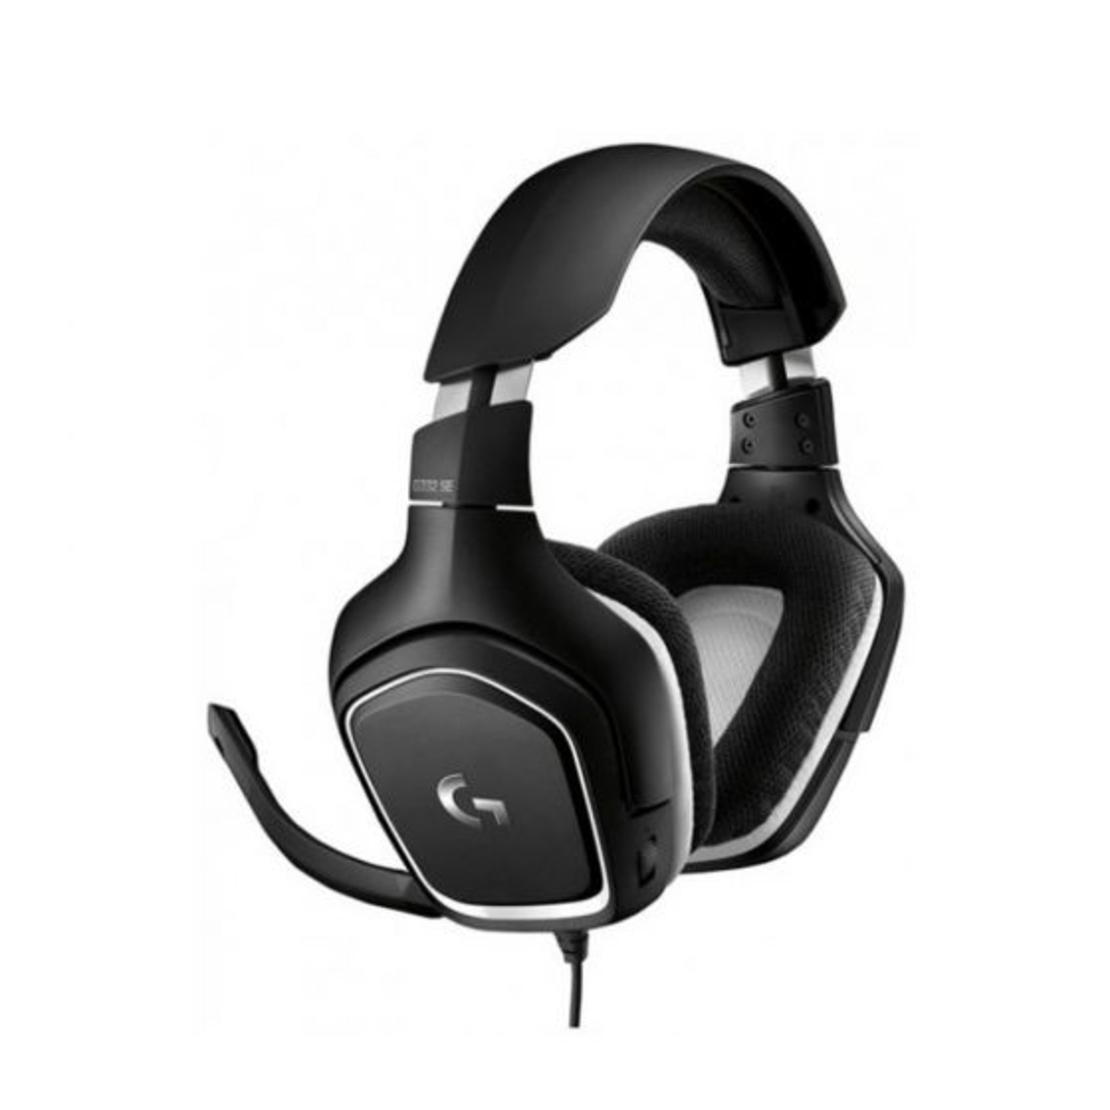 אוזניות גיימינג Logitech G332 Special Edition